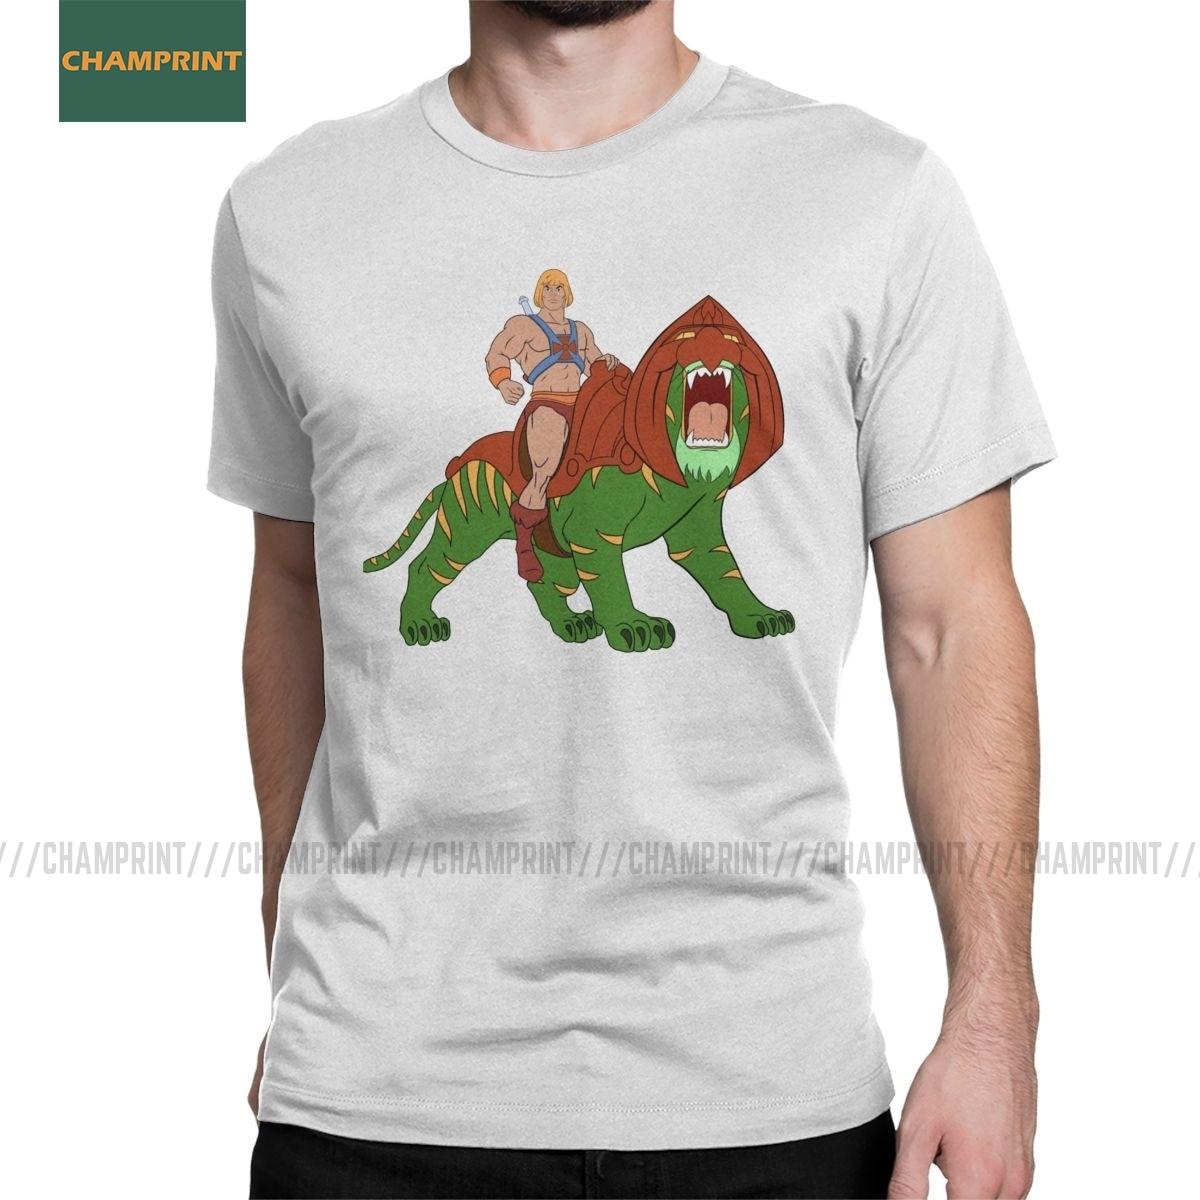 He man T-Shirt masters of the universe retro tee mens top 80/'s cartoon classic